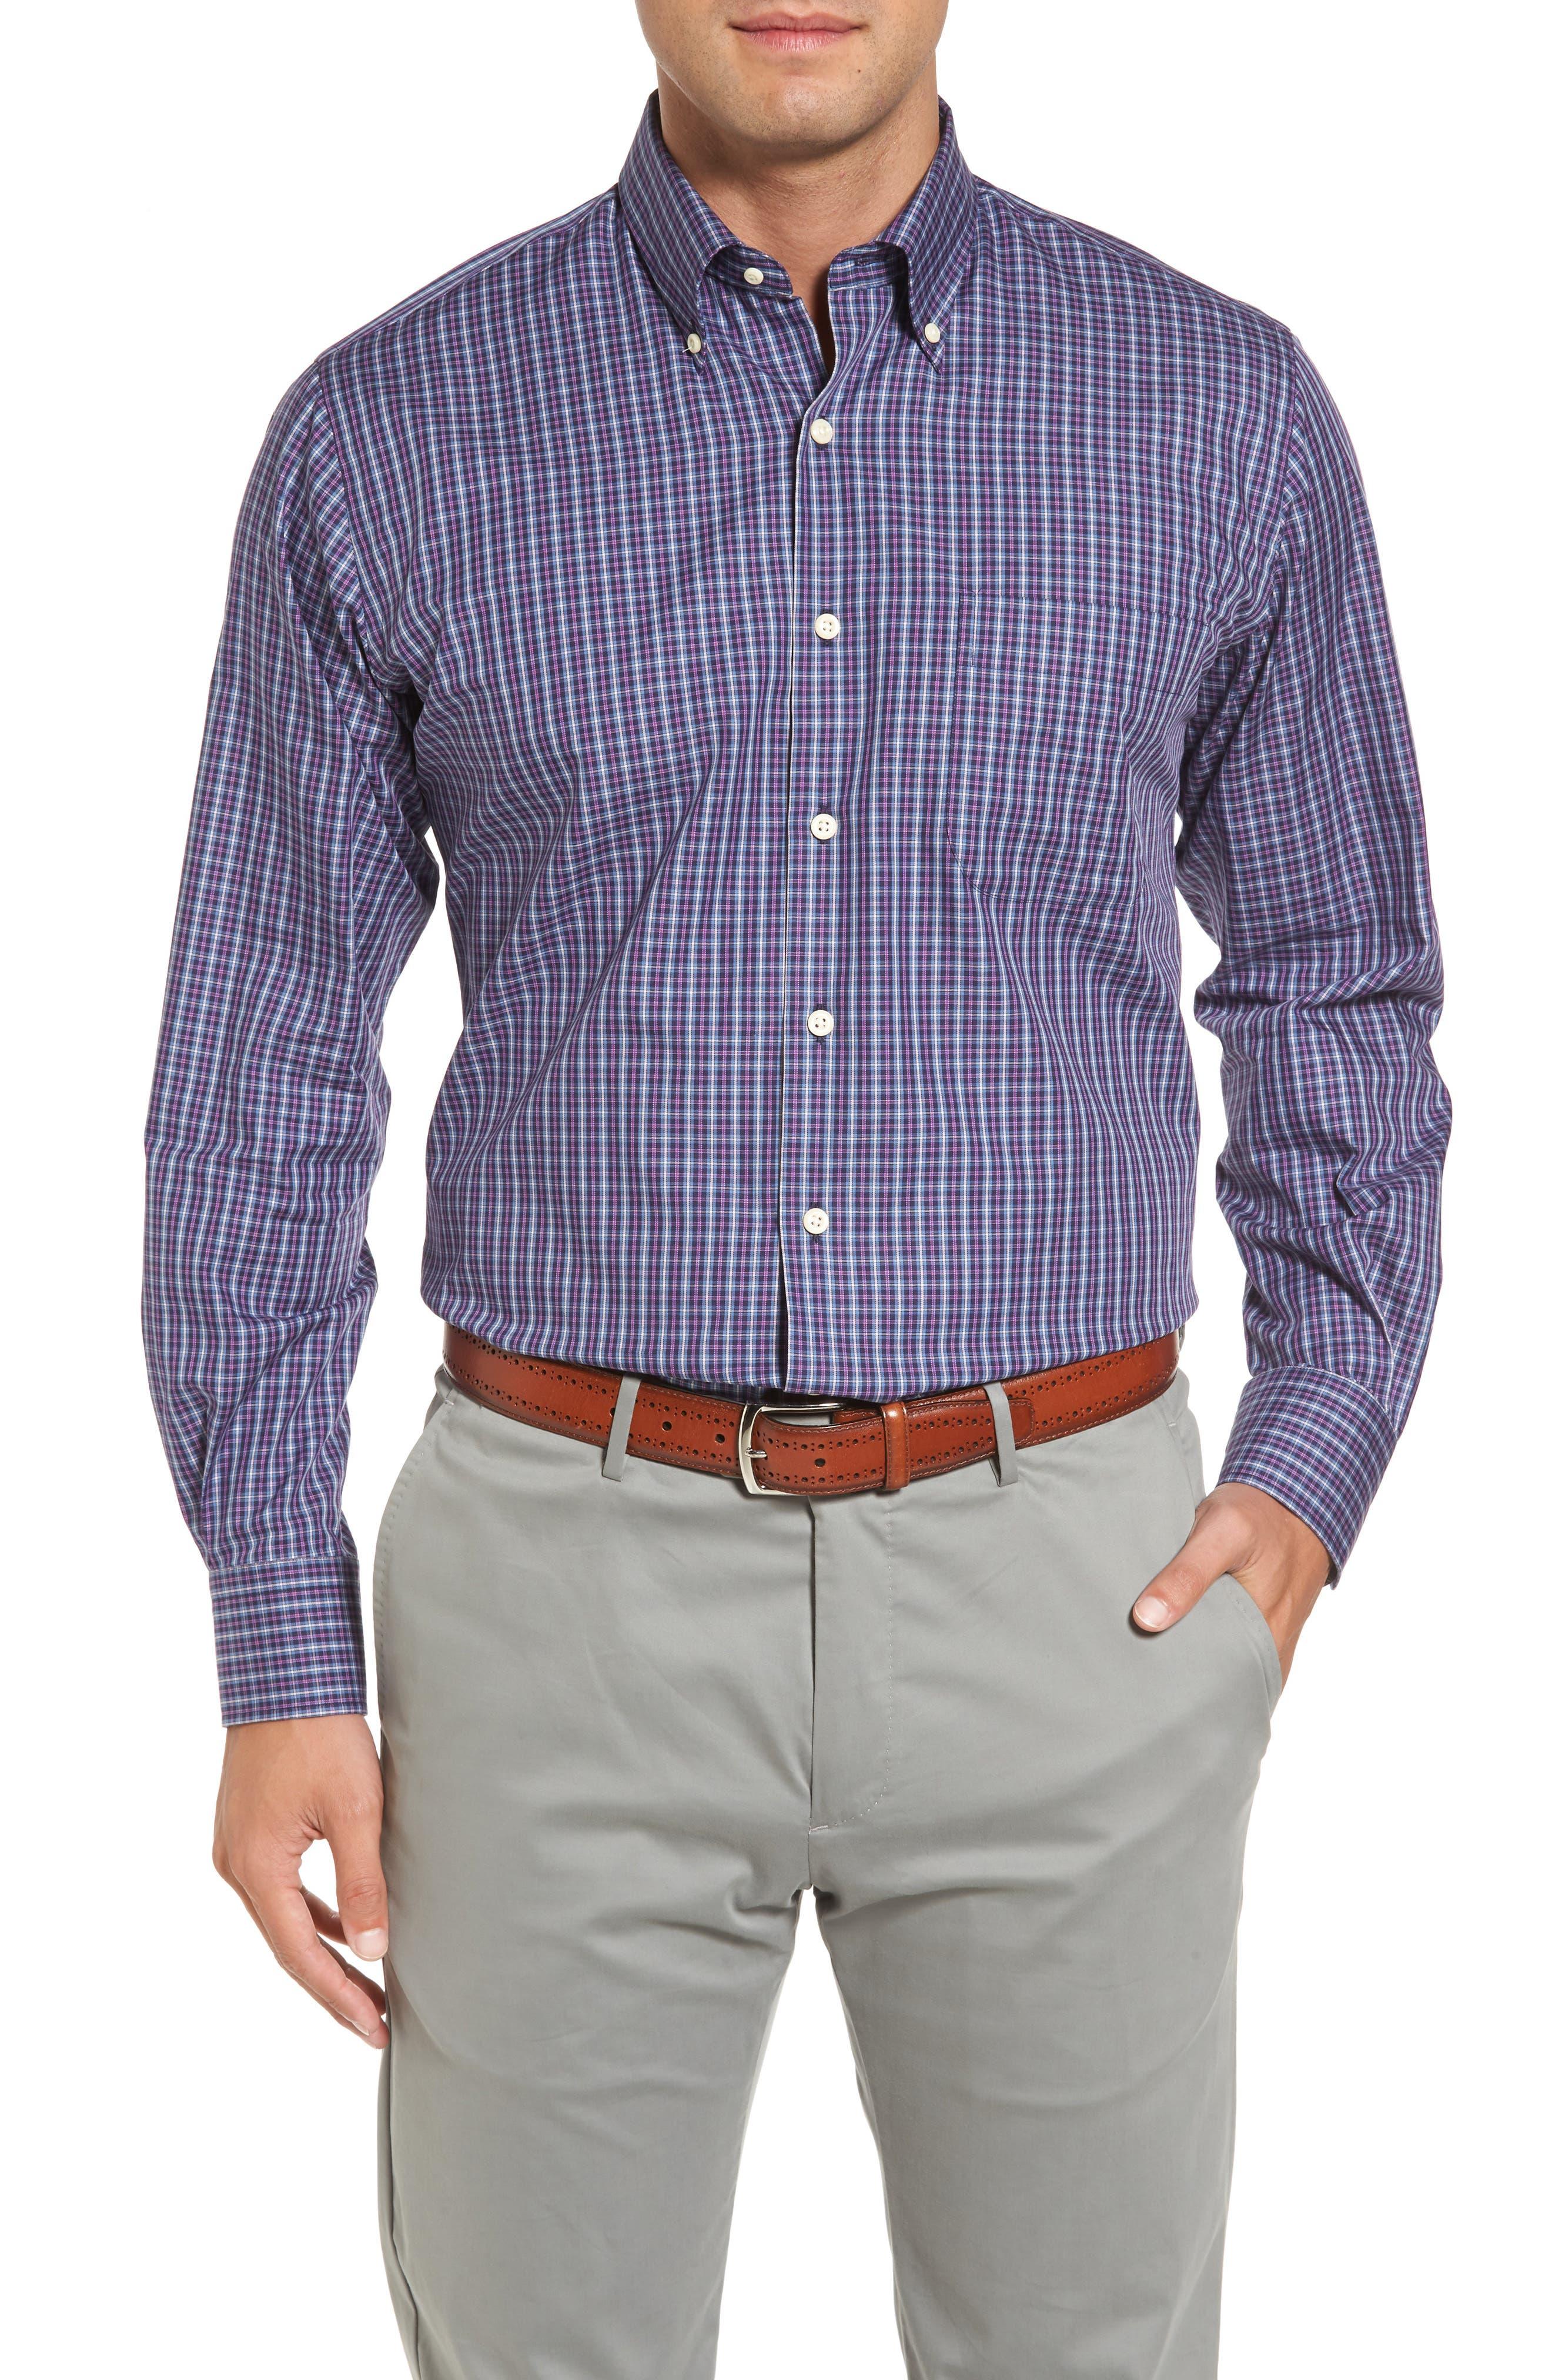 Hillock Regular Fit Plaid Sport Shirt,                             Main thumbnail 1, color,